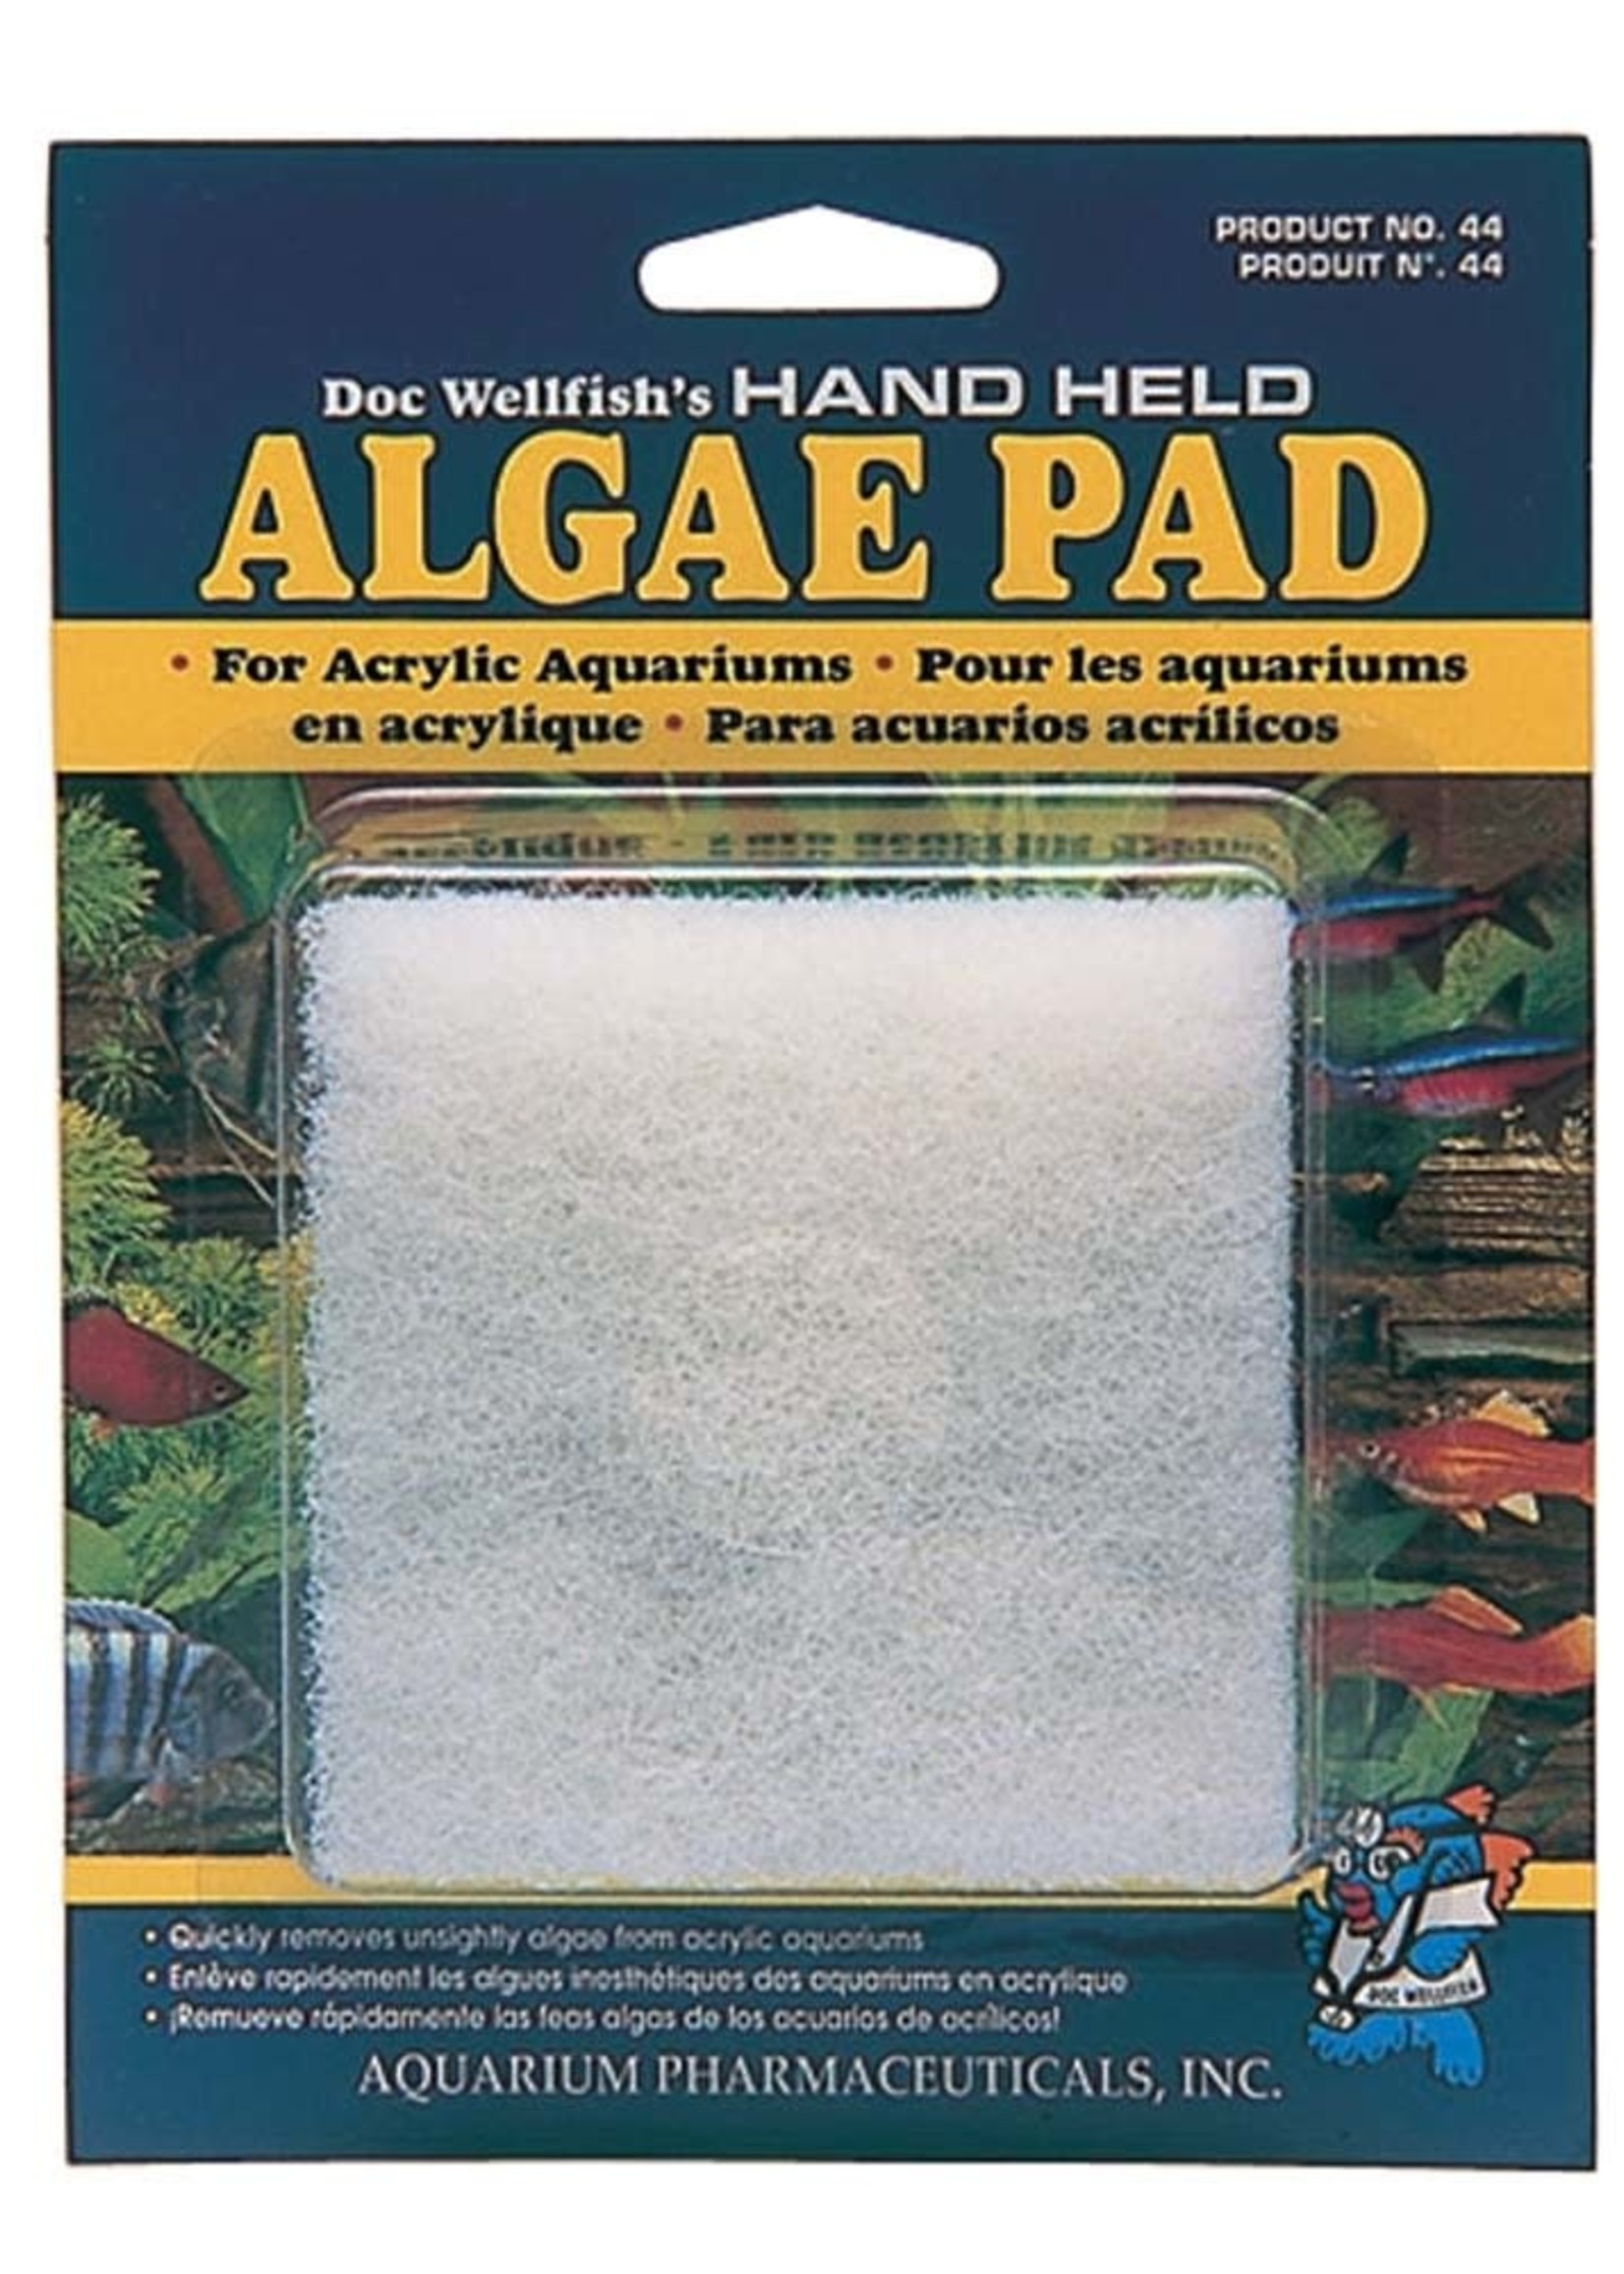 Mars Fishcare/API API Doc Wellfish's Hand Held Algae Pad Acrylic Aquariums